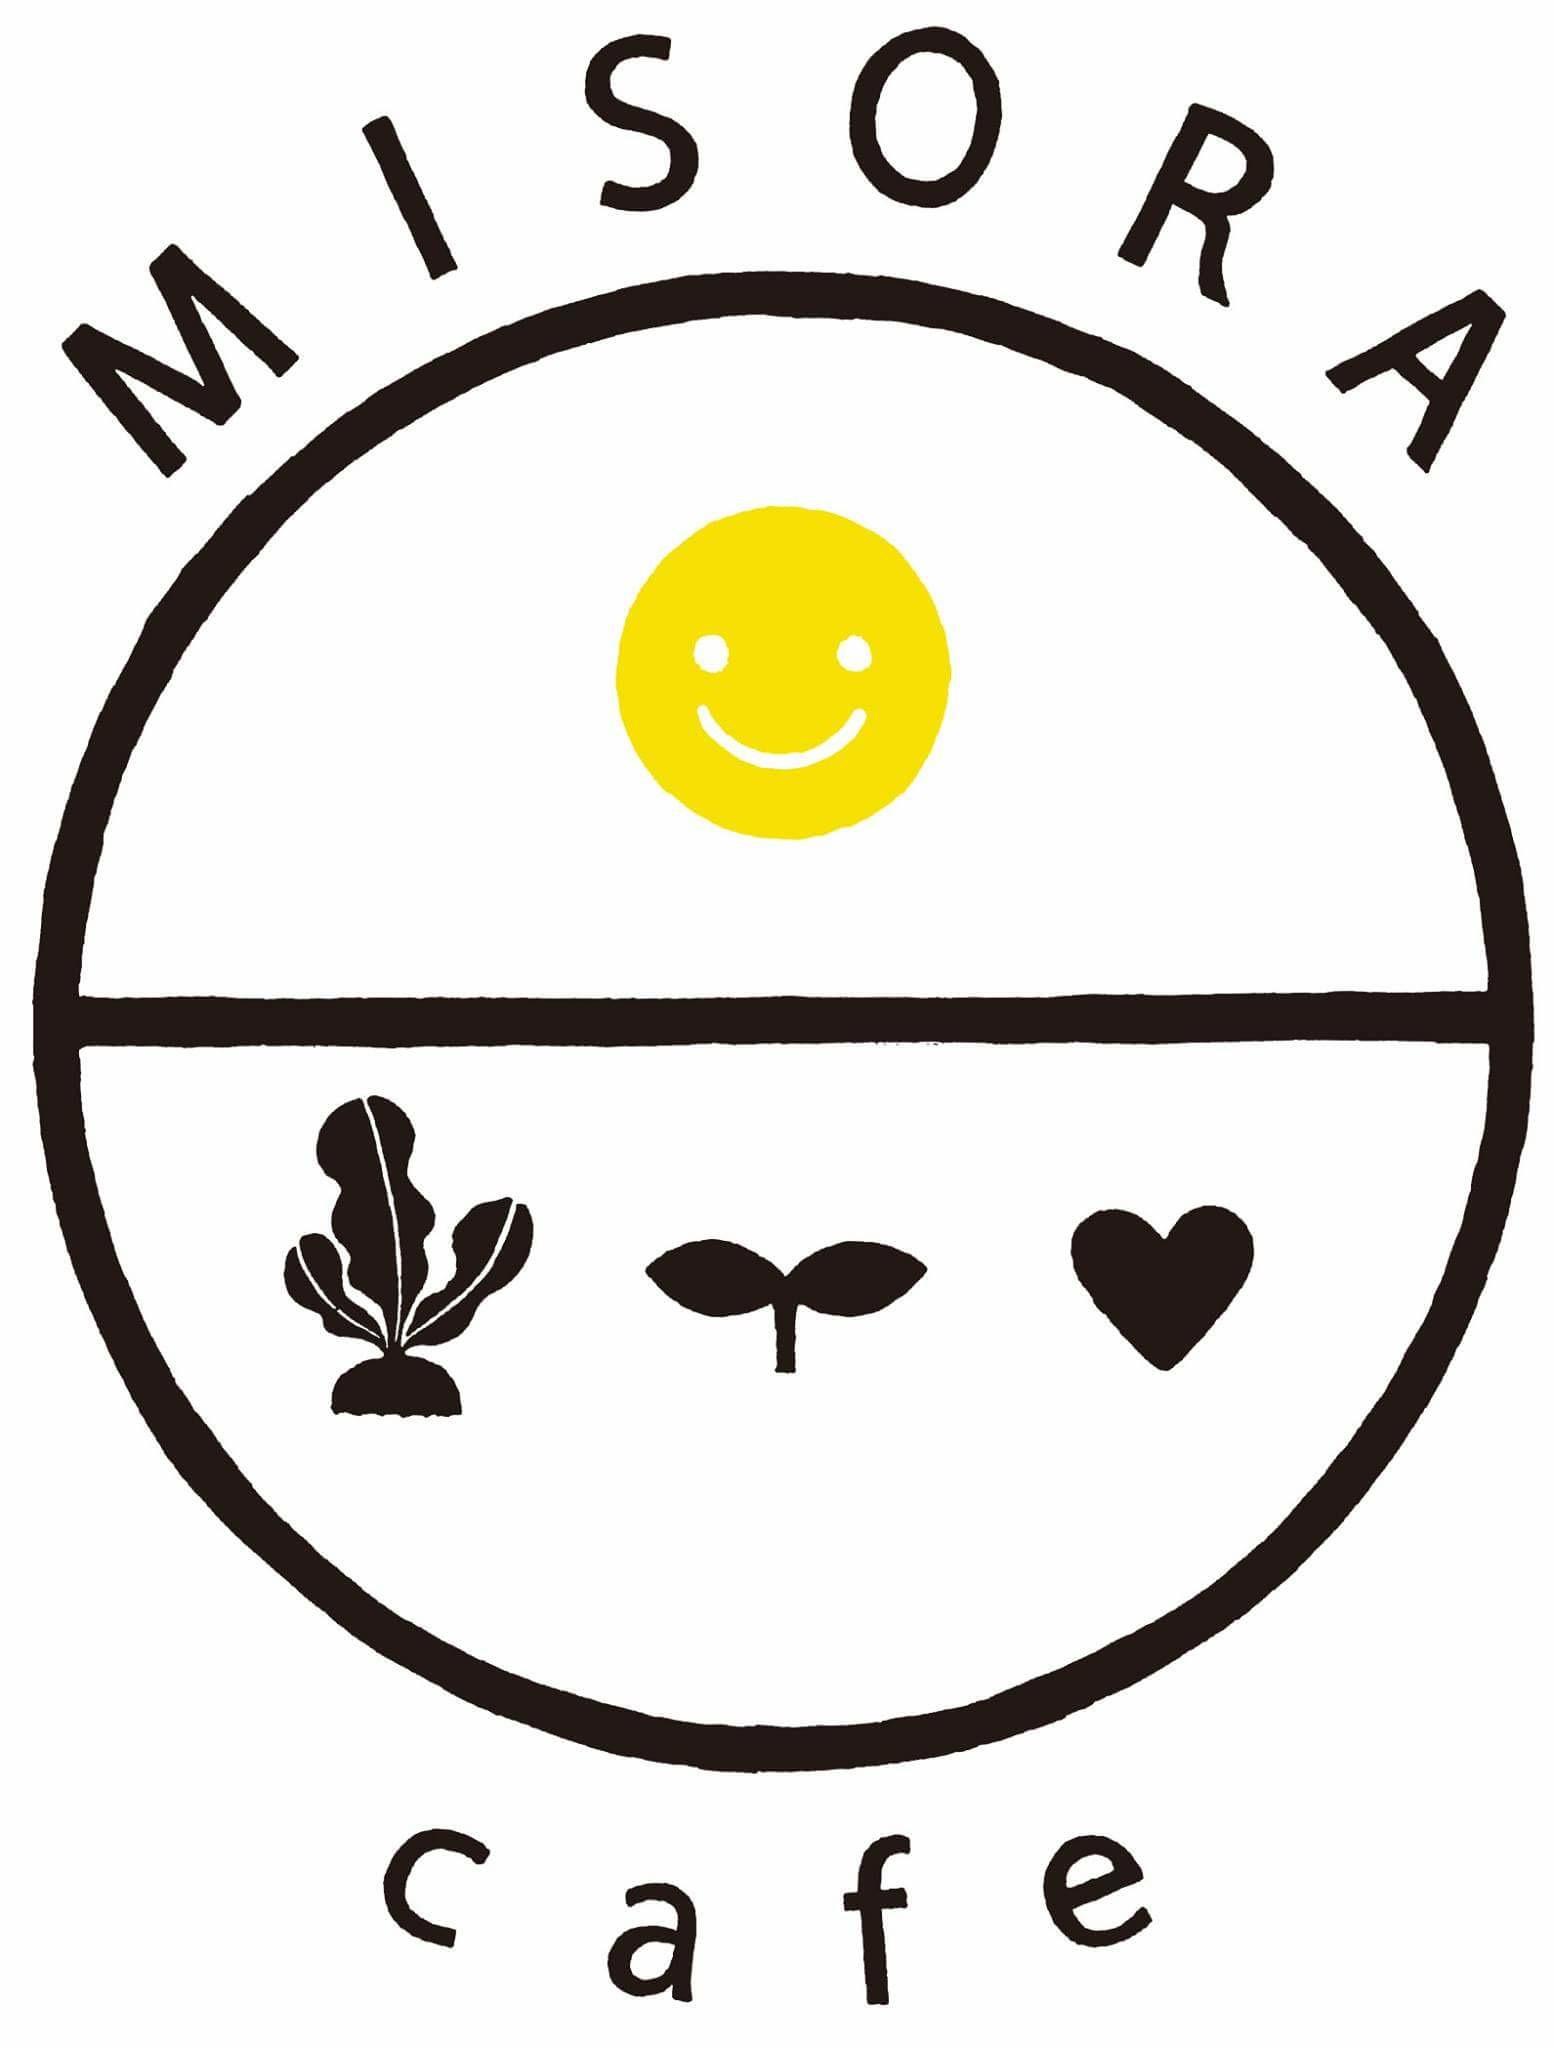 MISORA cafe 〜子ども向け雑貨と美味しい珈琲の店〜